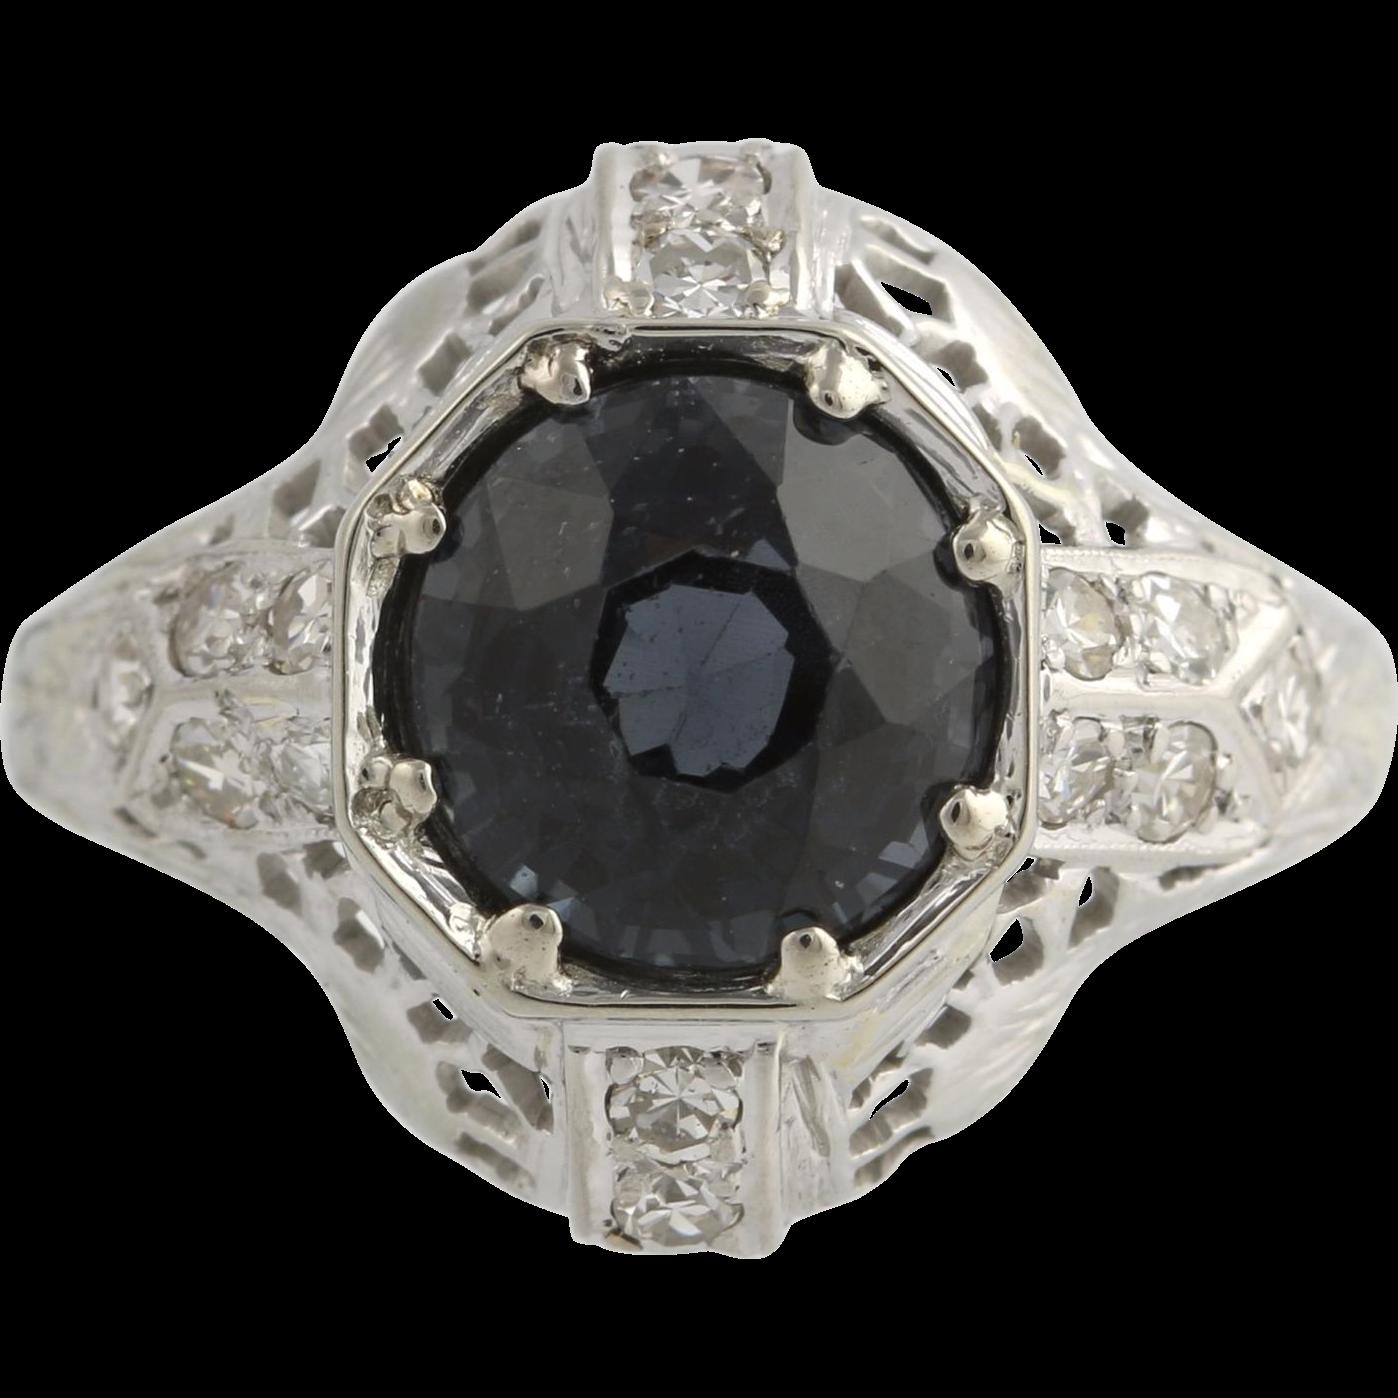 Art Deco Blue Spinel Cocktail Ring - Platinum Vintage Genuine Diamonds 2.97ctw